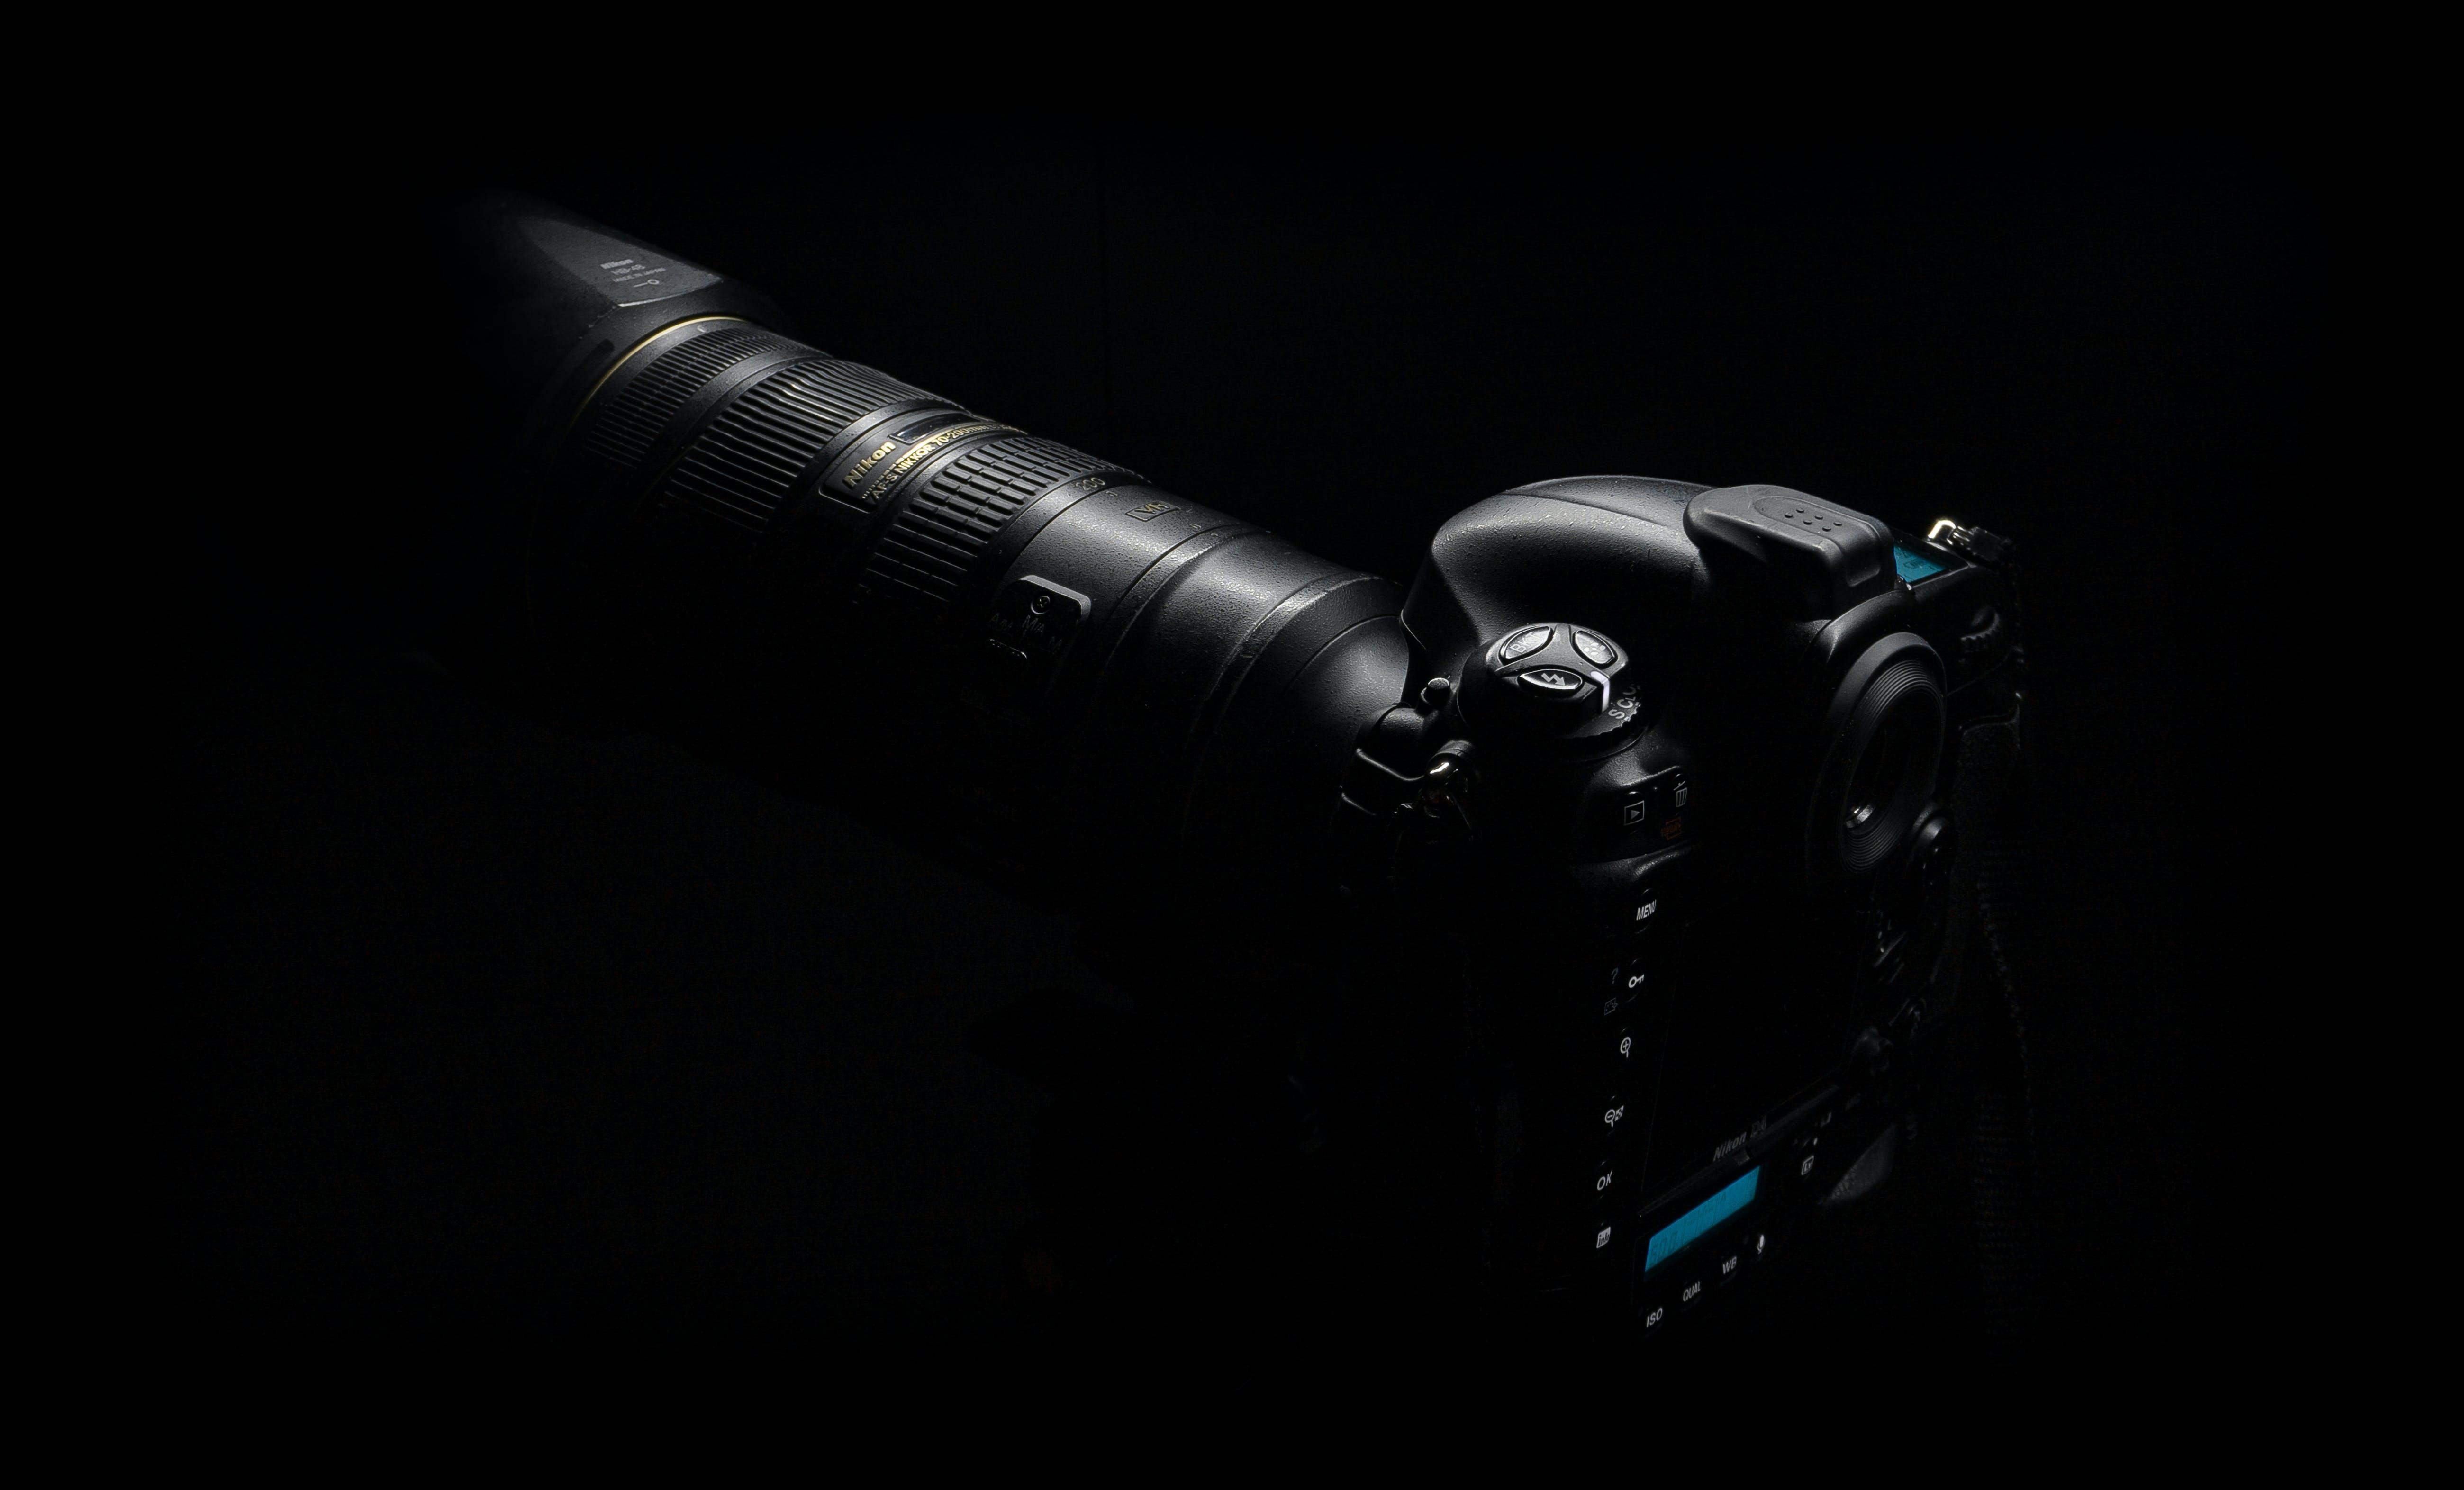 Photo of Black Dslr Camera